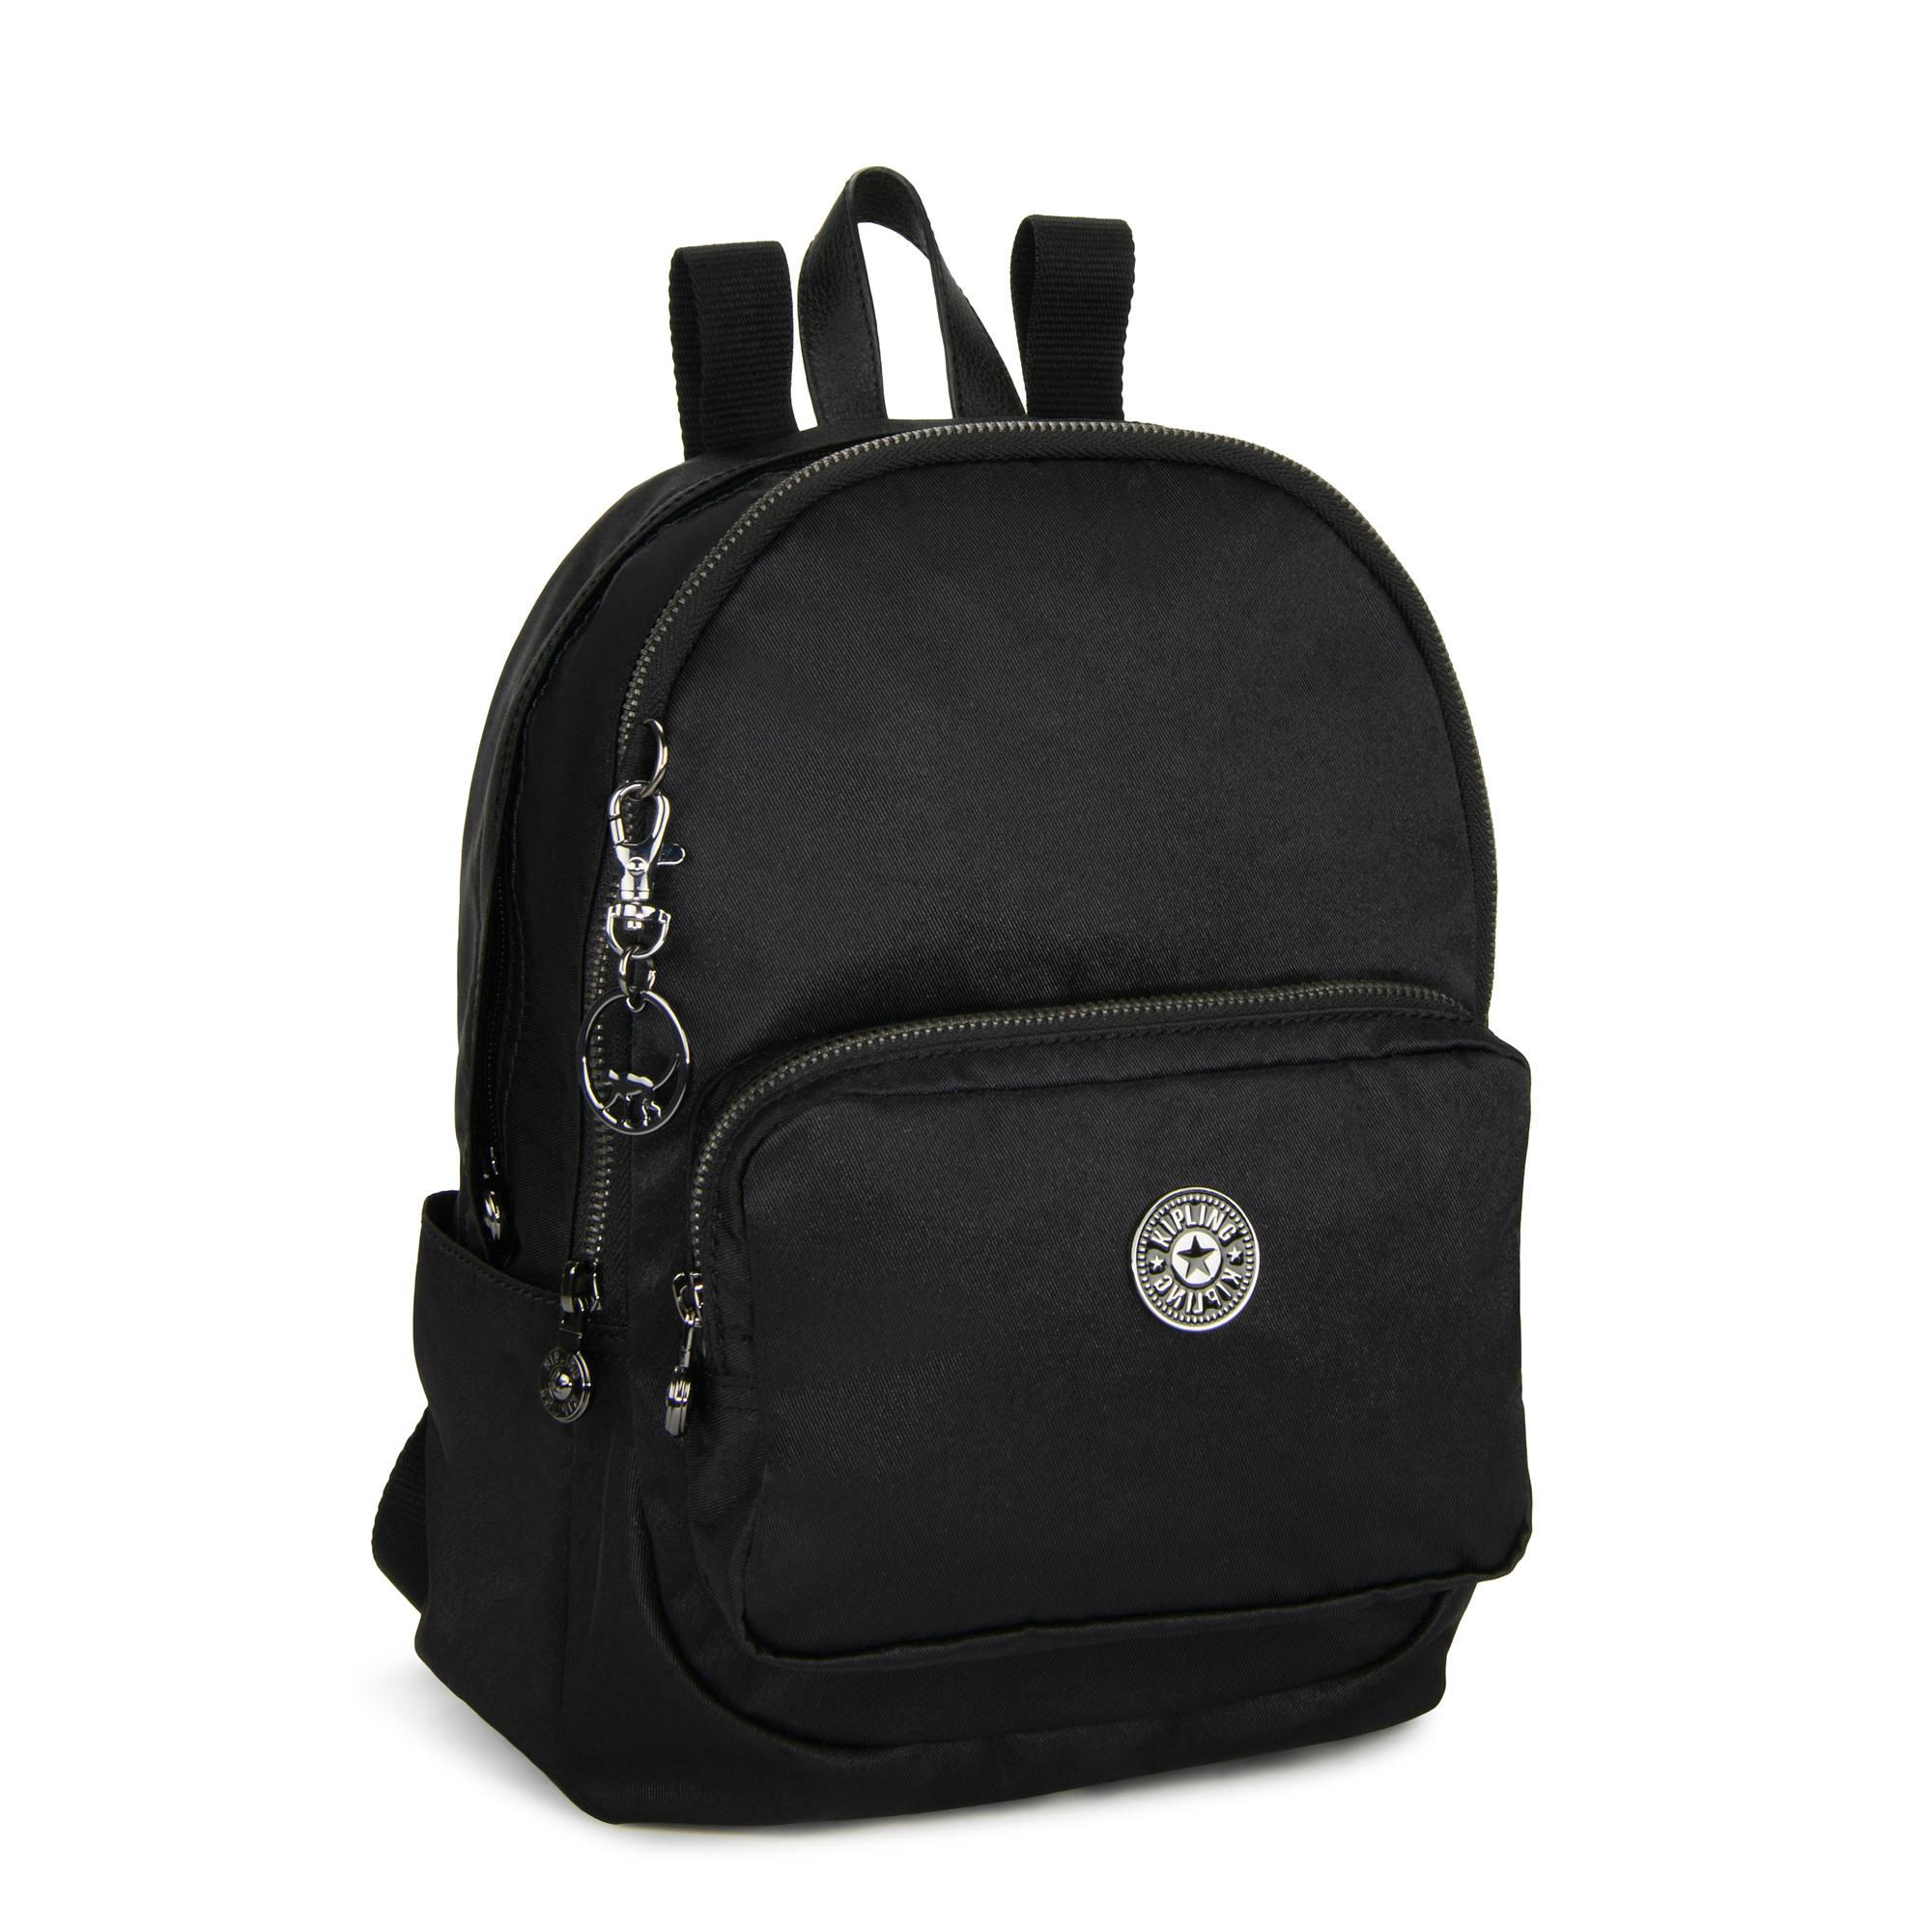 5309c8982c98 Kipling-Tabbie-Small-Backpack thumbnail 5